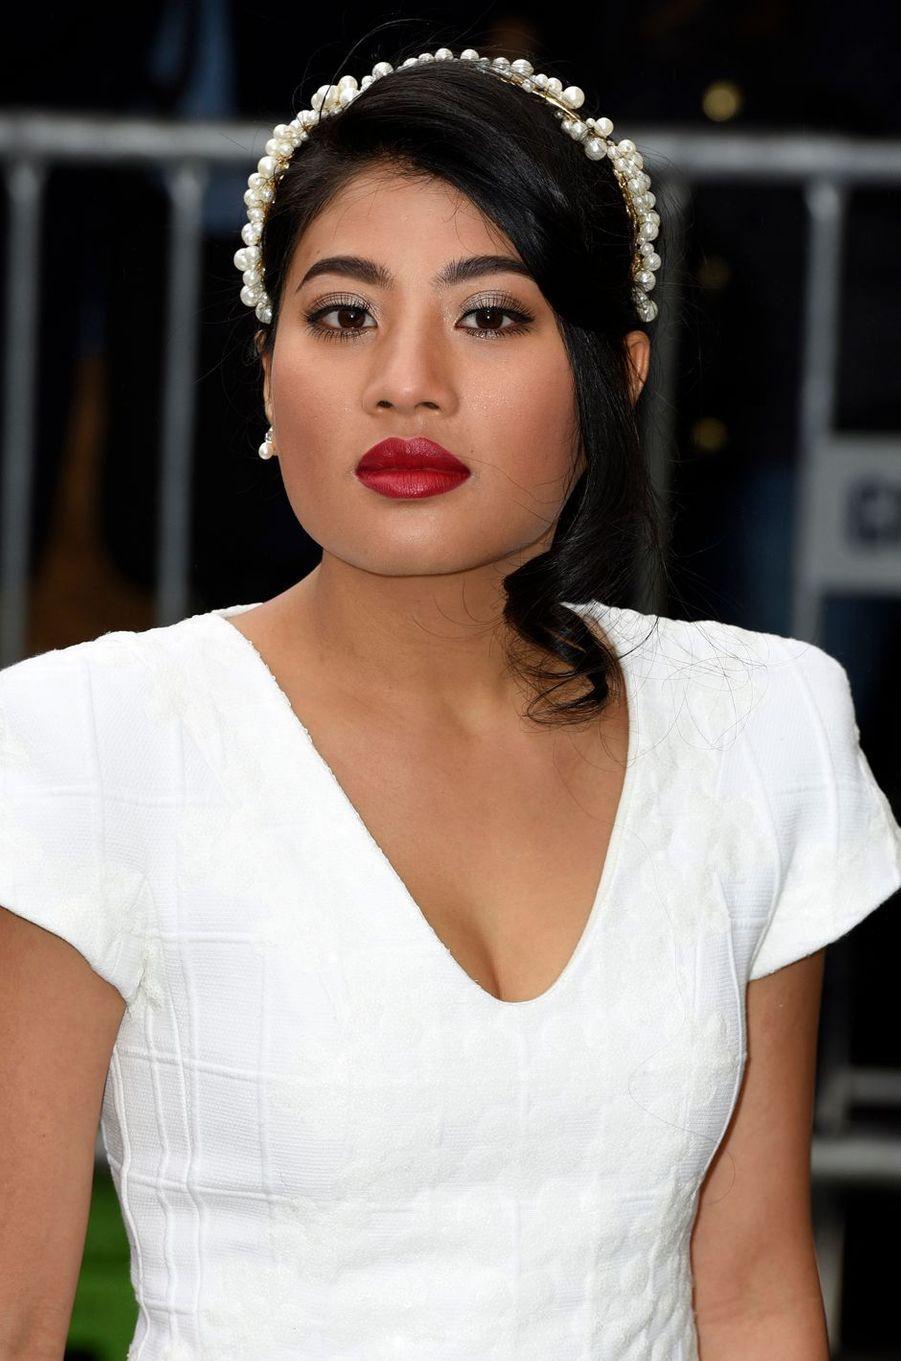 La princesse Sirivannavari Nariratana de Thaïlande à Paris, le 10 mars 2015